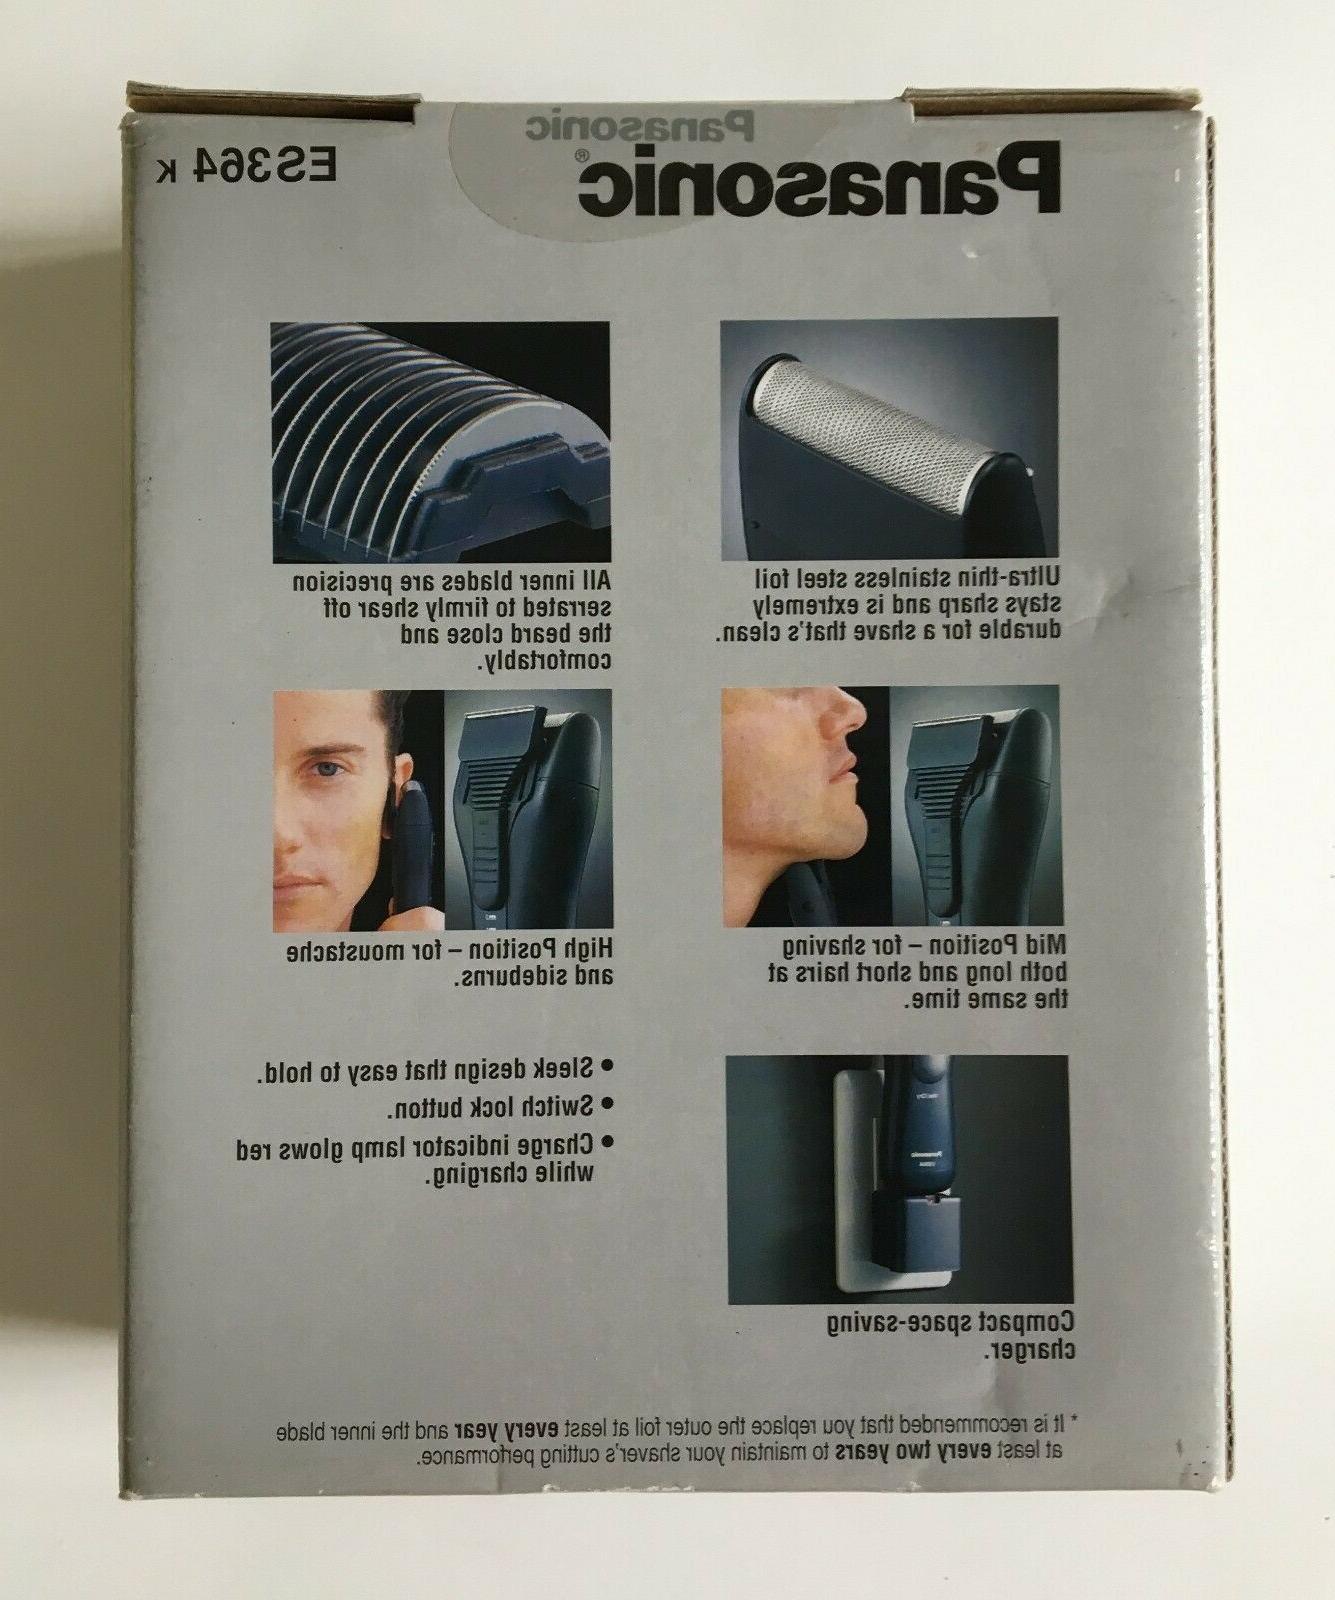 Panasonic Sonic -1 Wet/Dry Electric Shaver